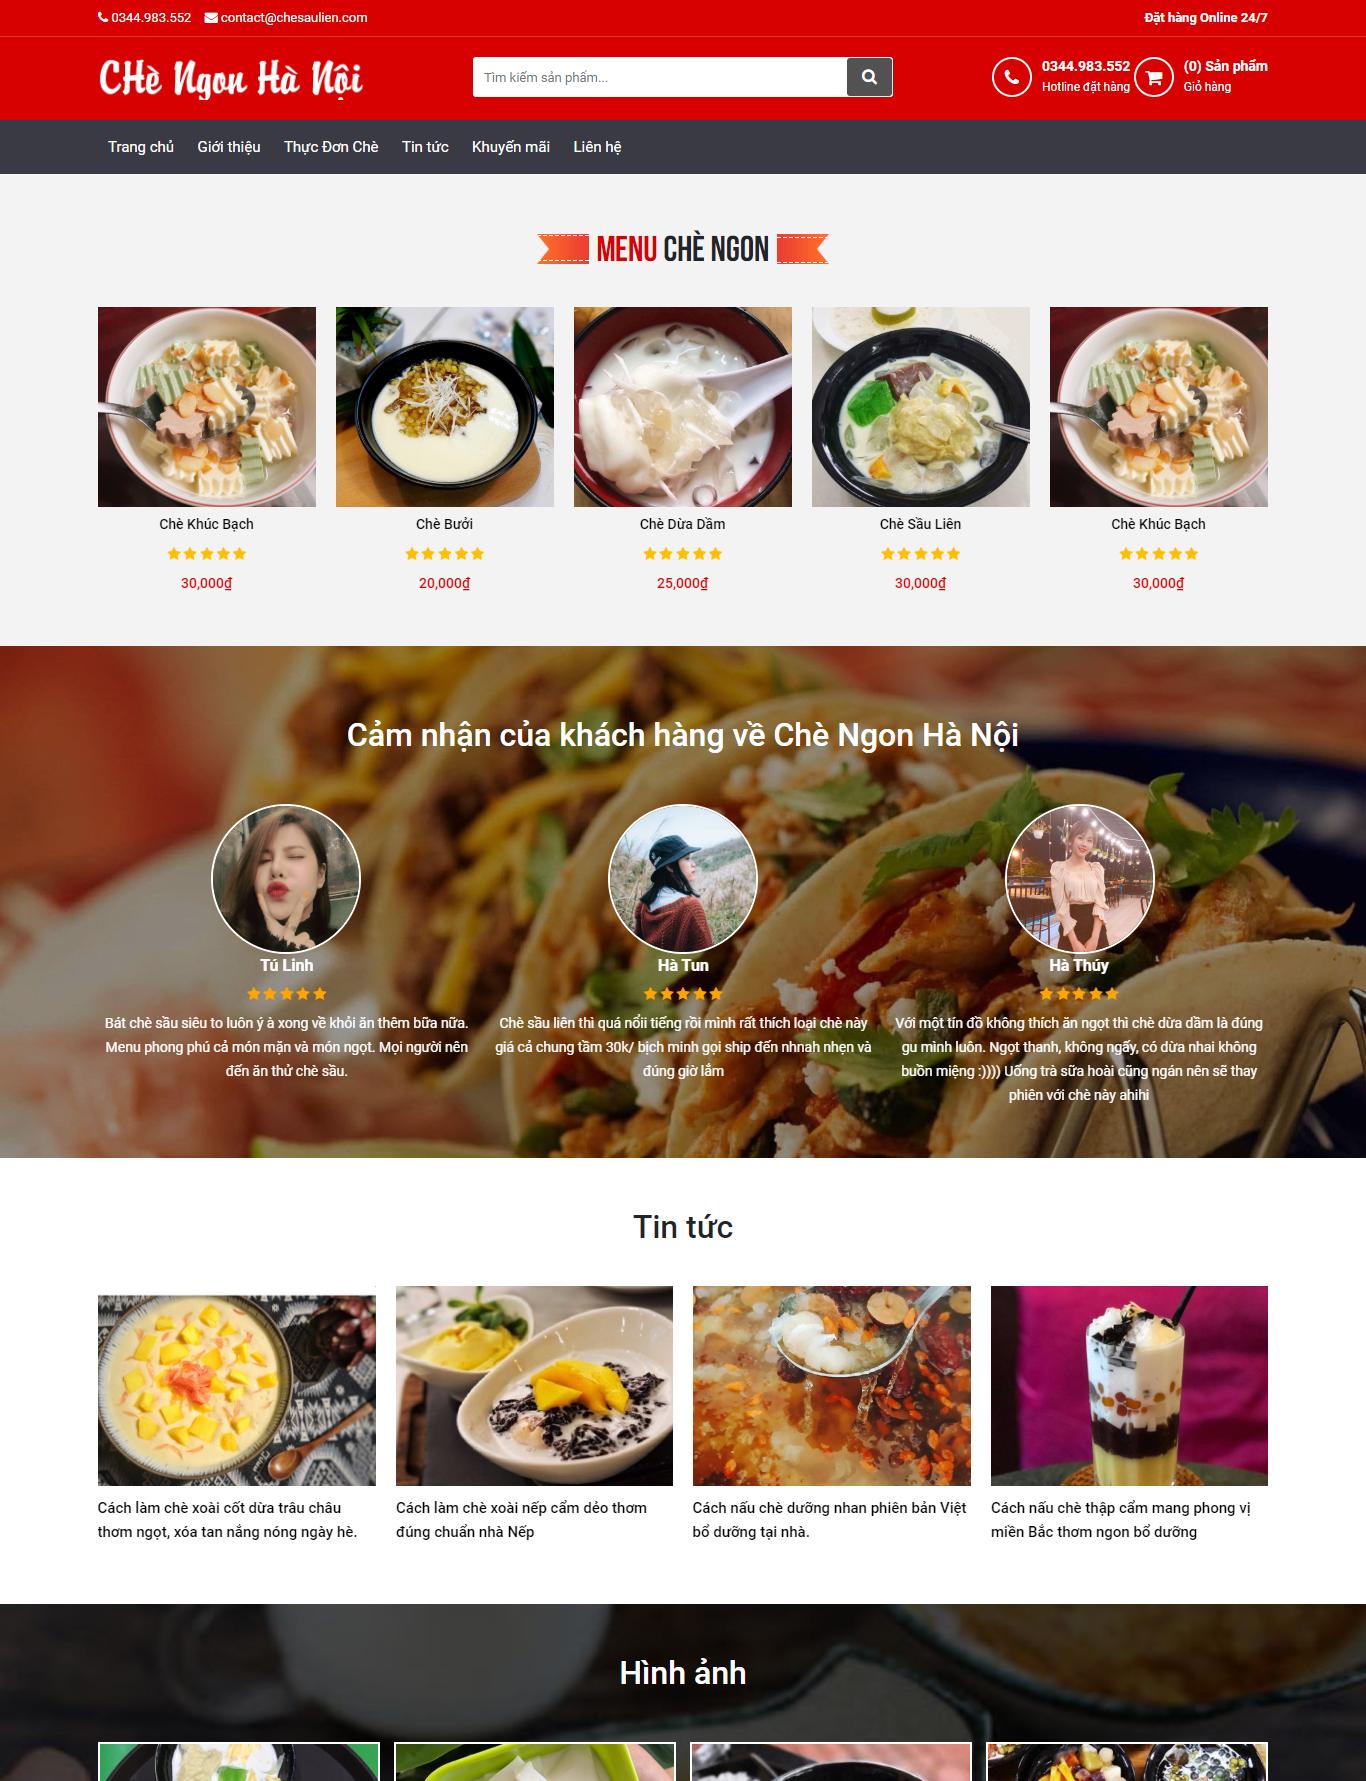 Mẫu website bán chè online